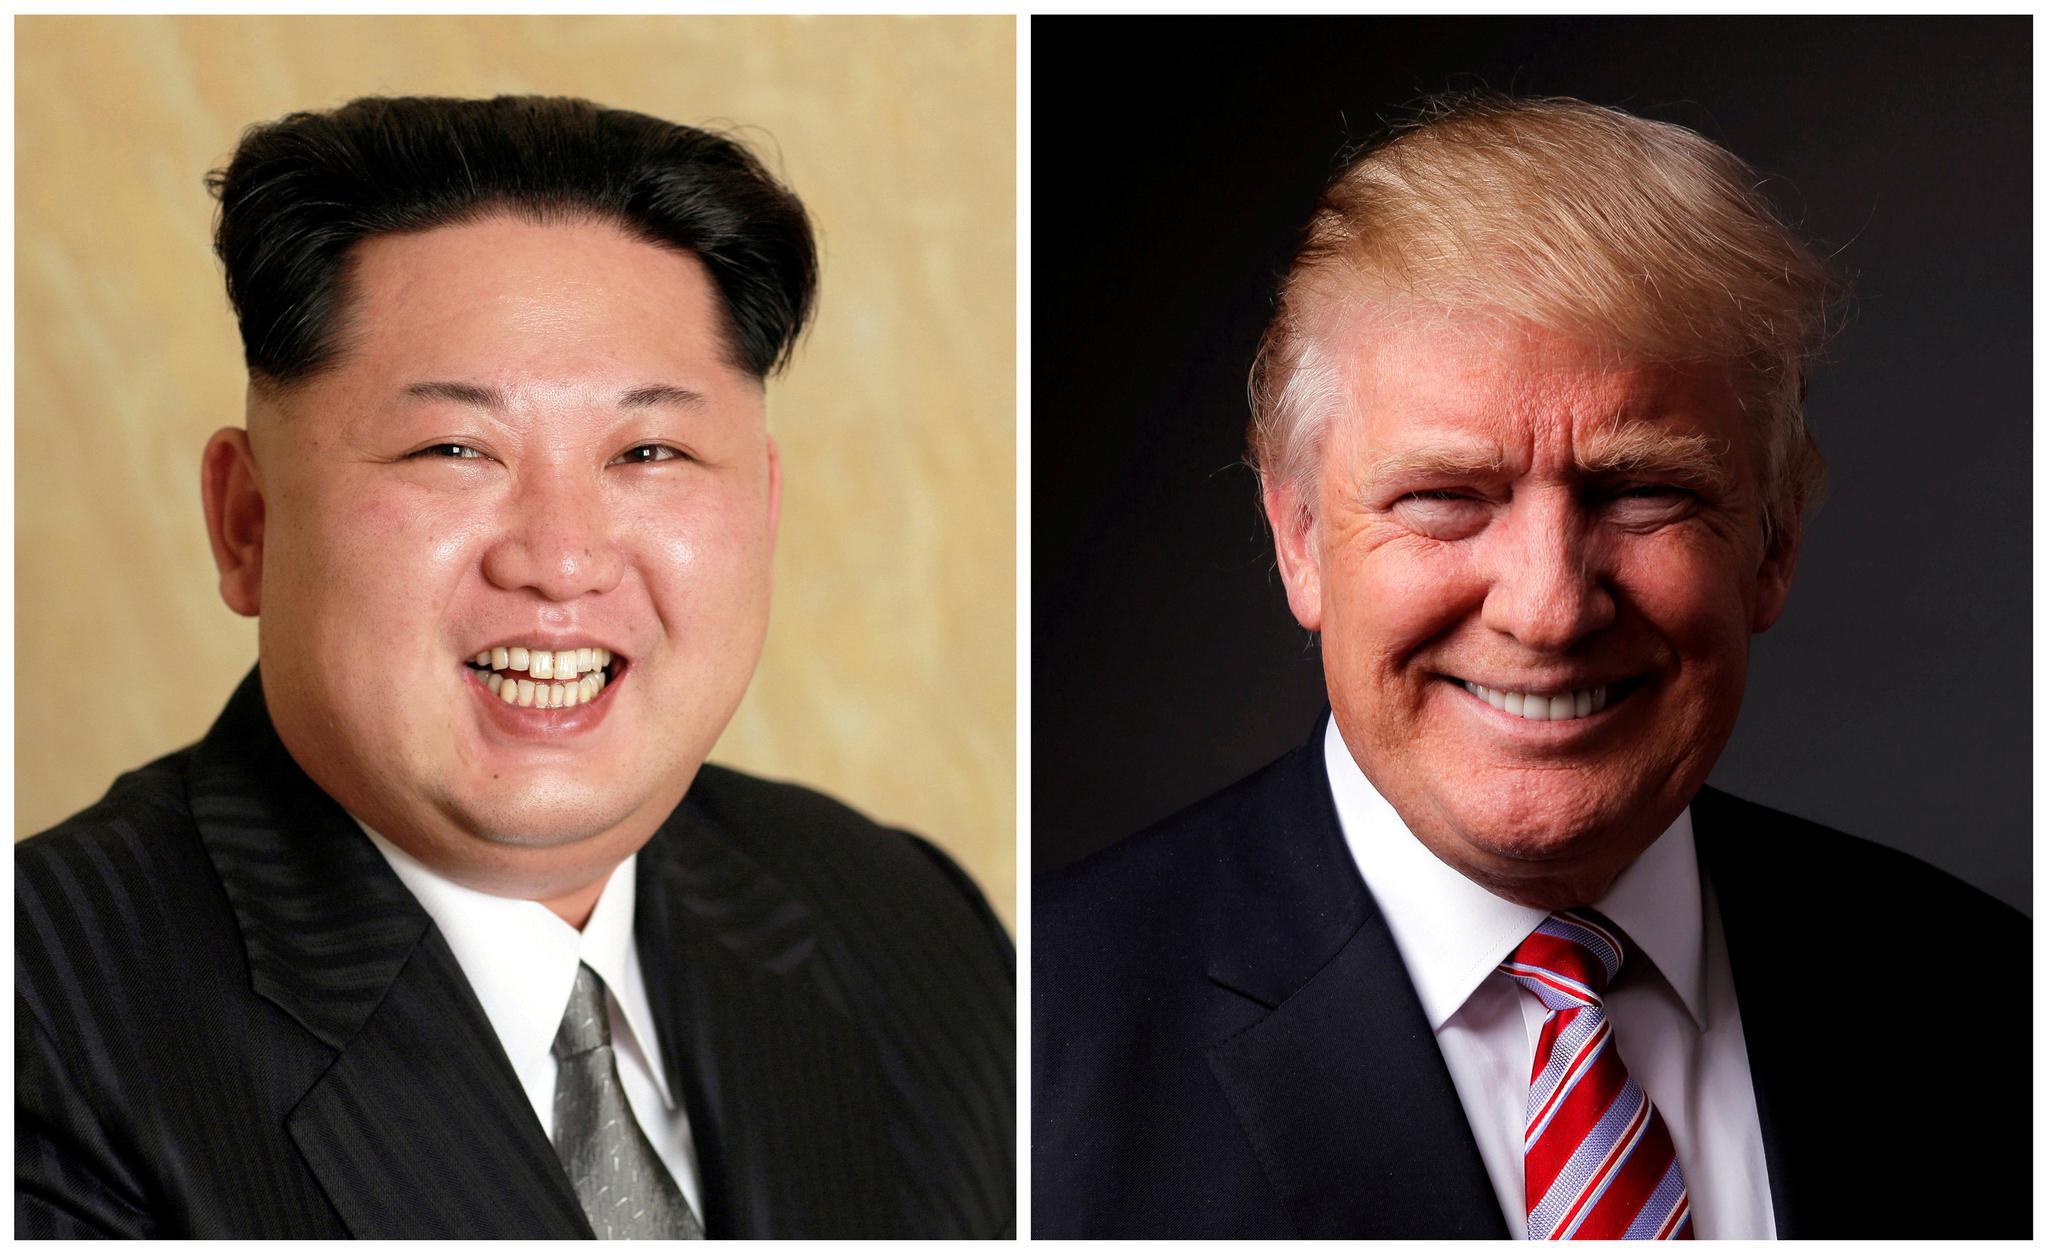 A combination of portraits of North Korean leader Kim Jong Un and of U.S. President Donald Trump.